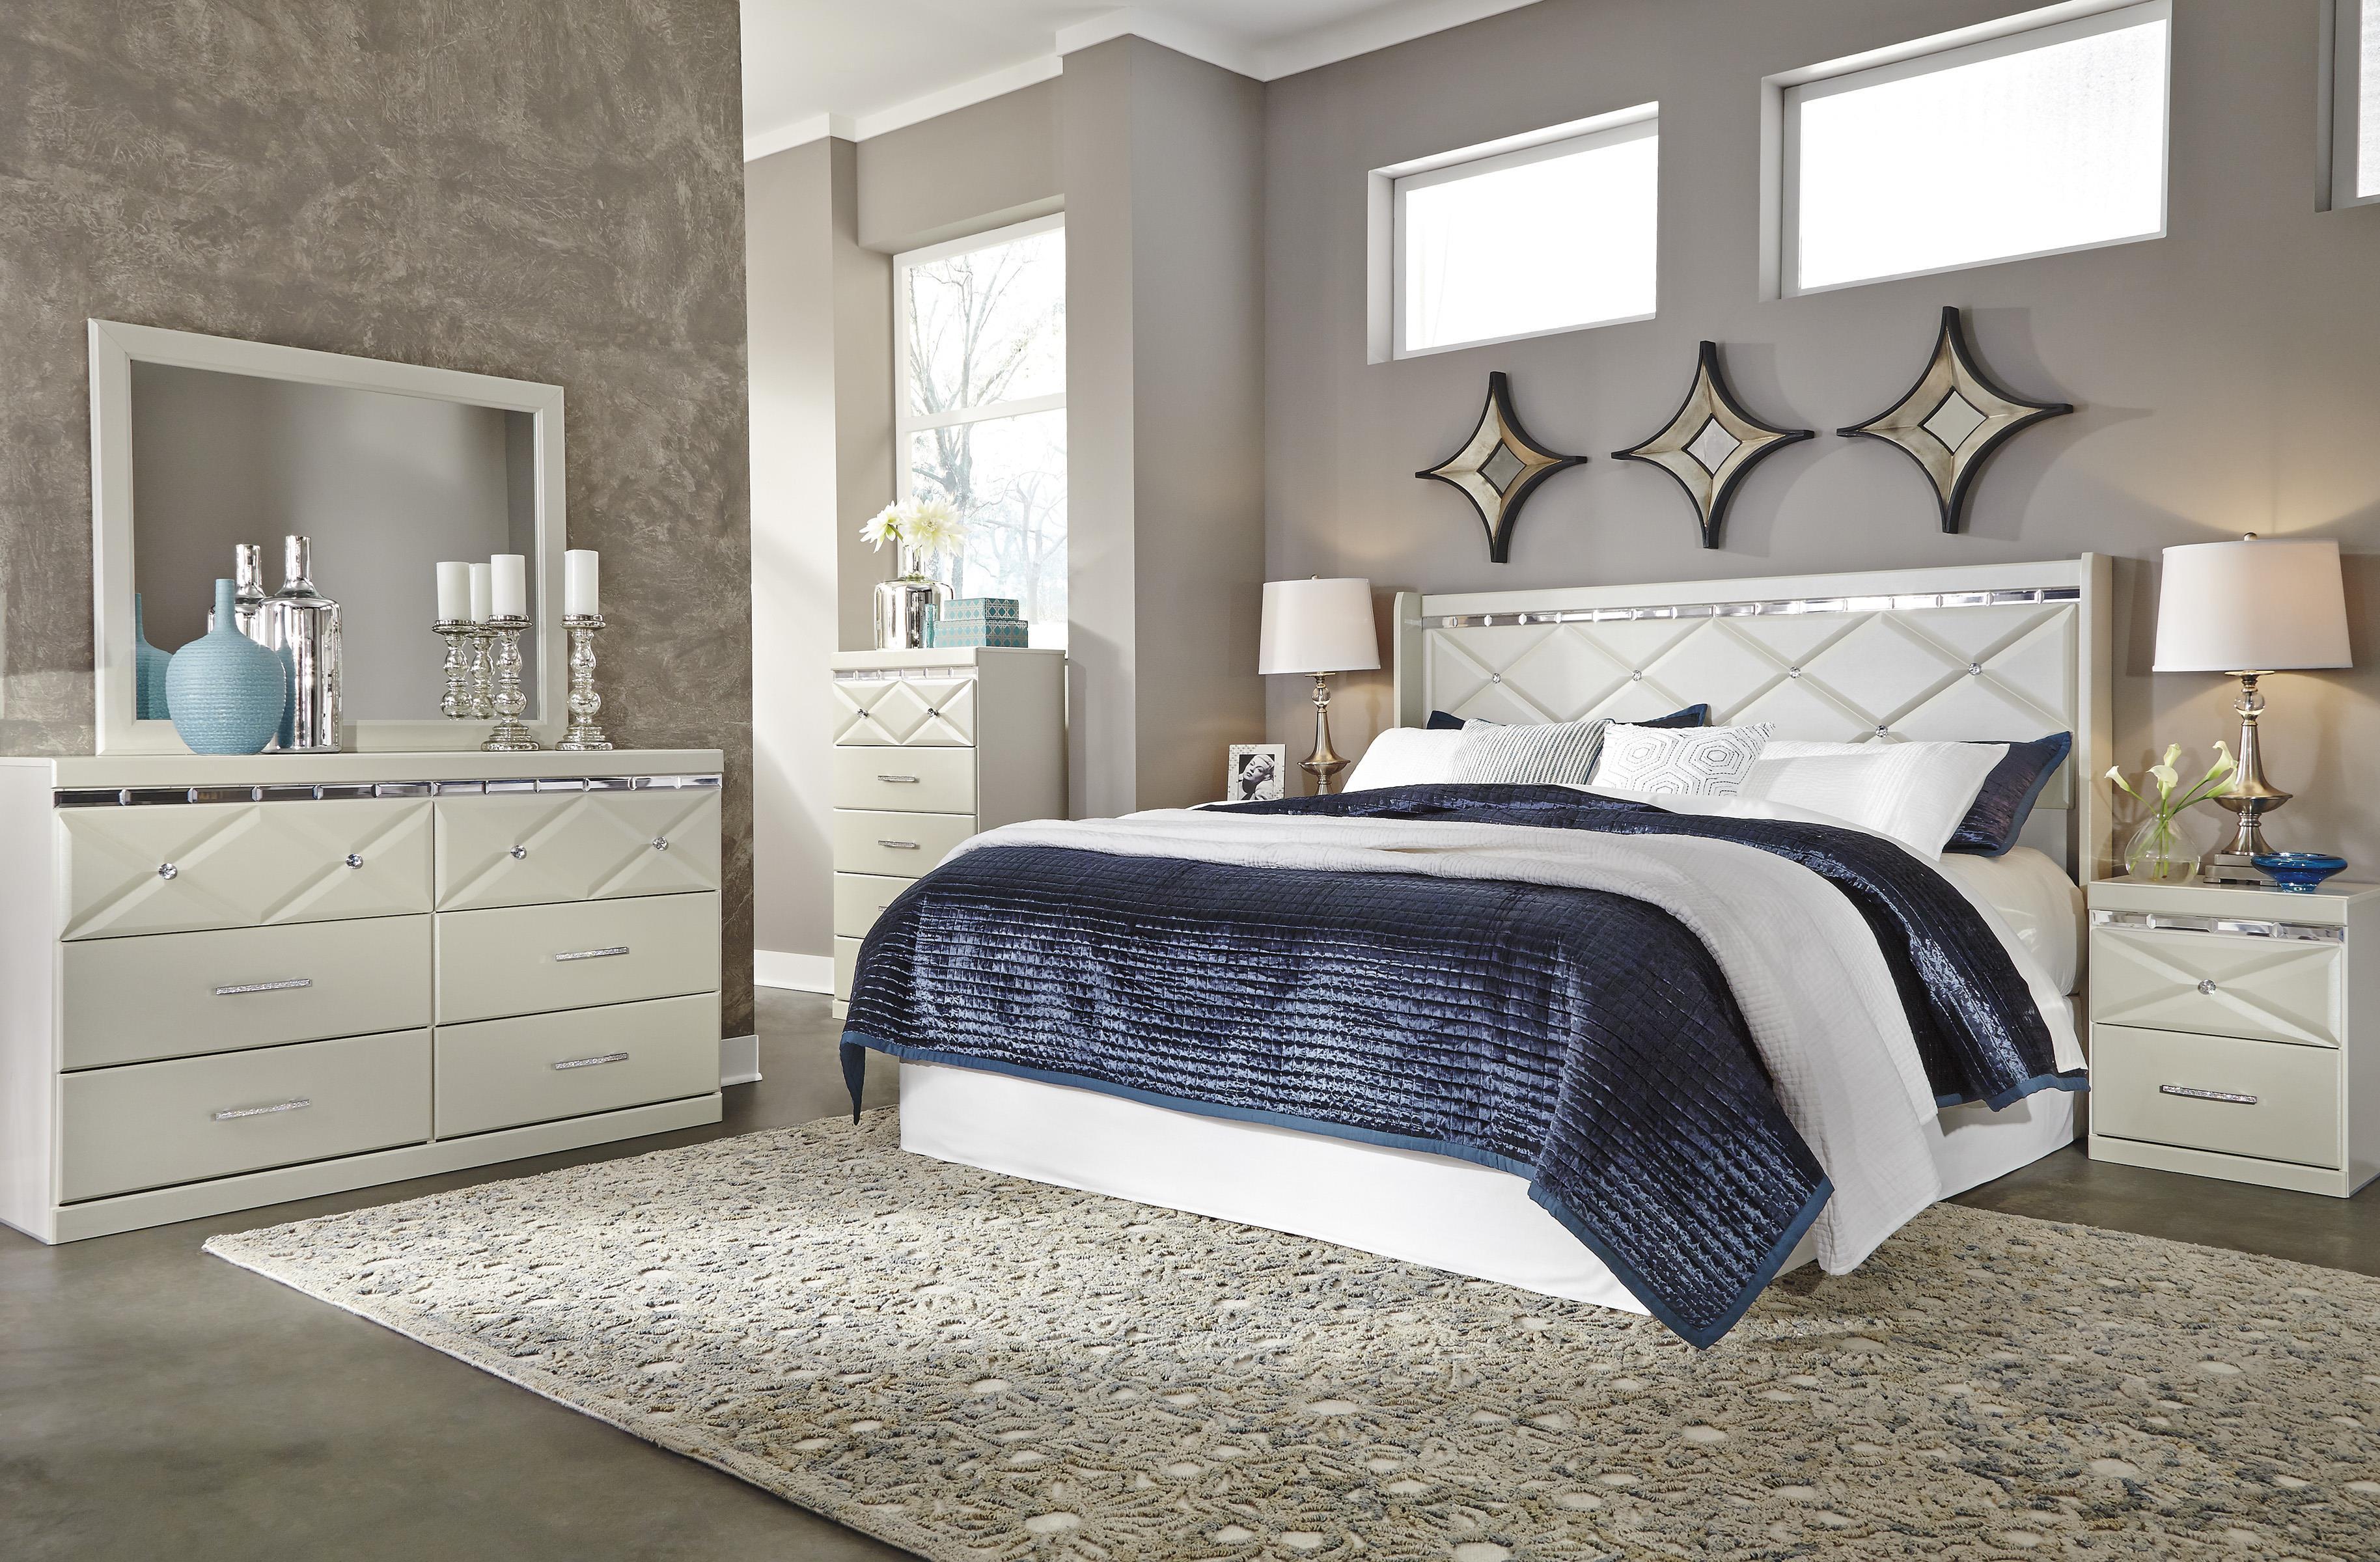 Signature design by ashley dreamur b351 31 6 drawer - Ashley furniture bedroom dressers ...